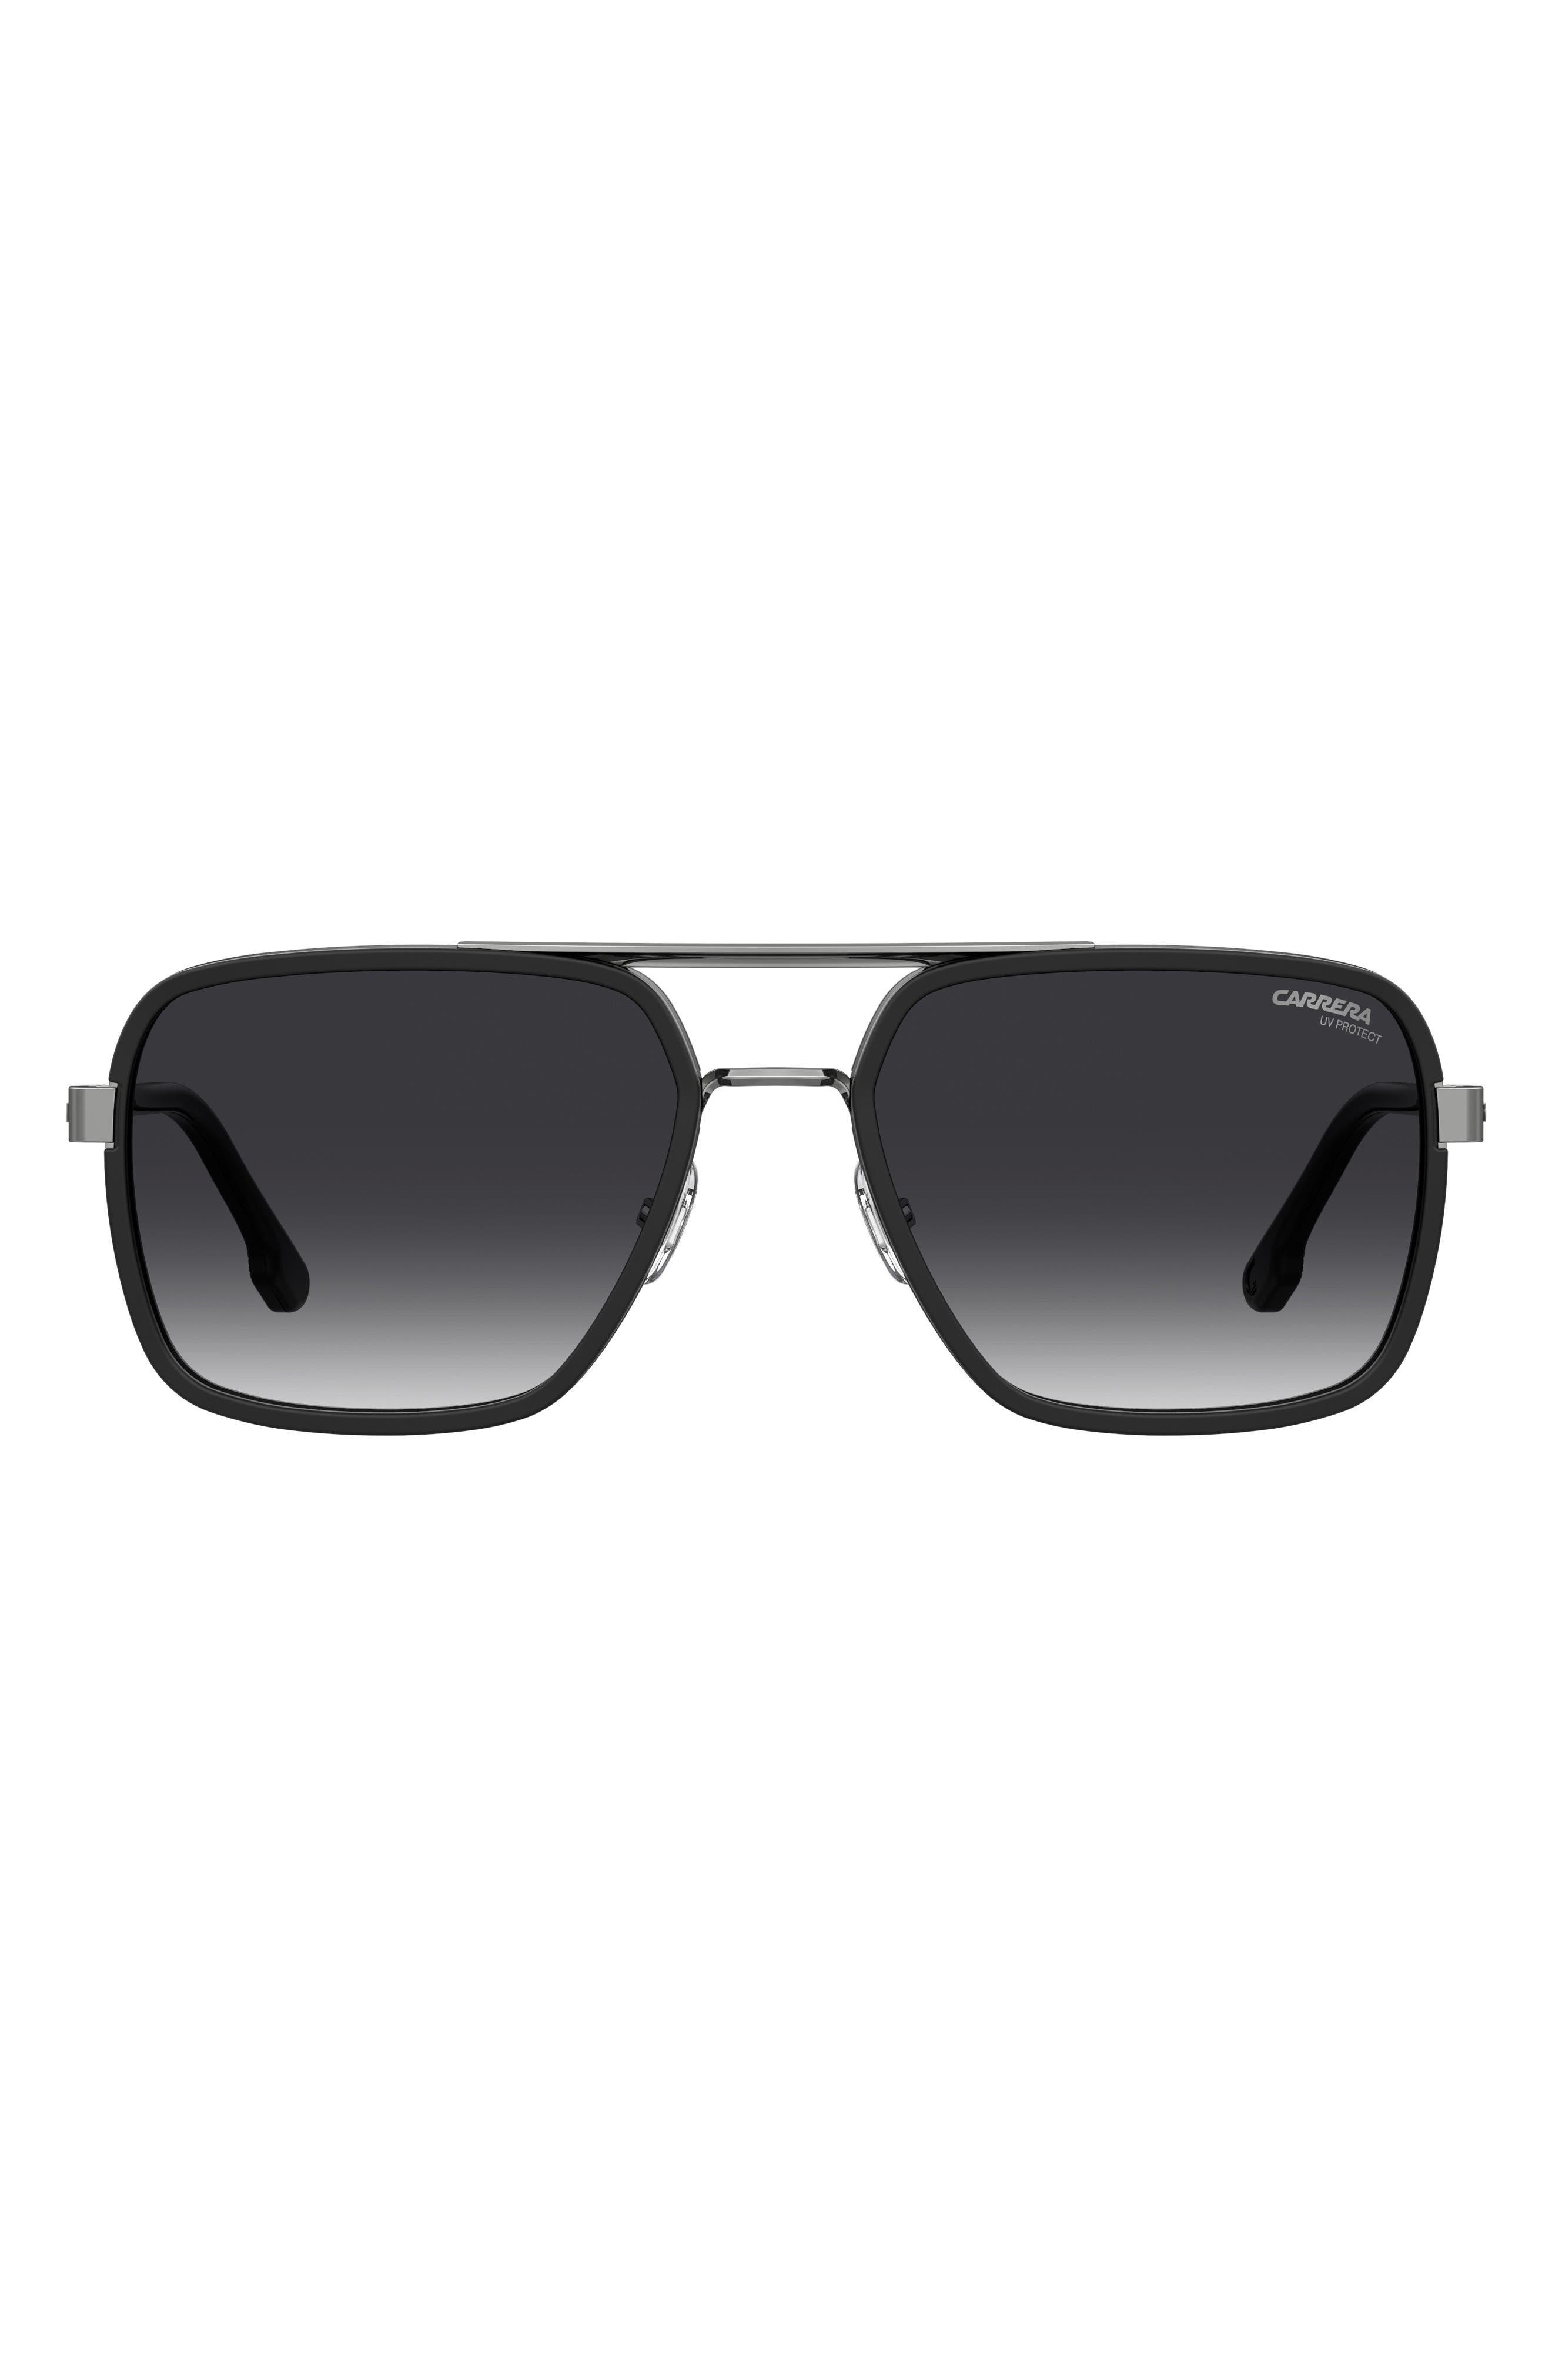 58mm Gradient Aviator Sunglasses